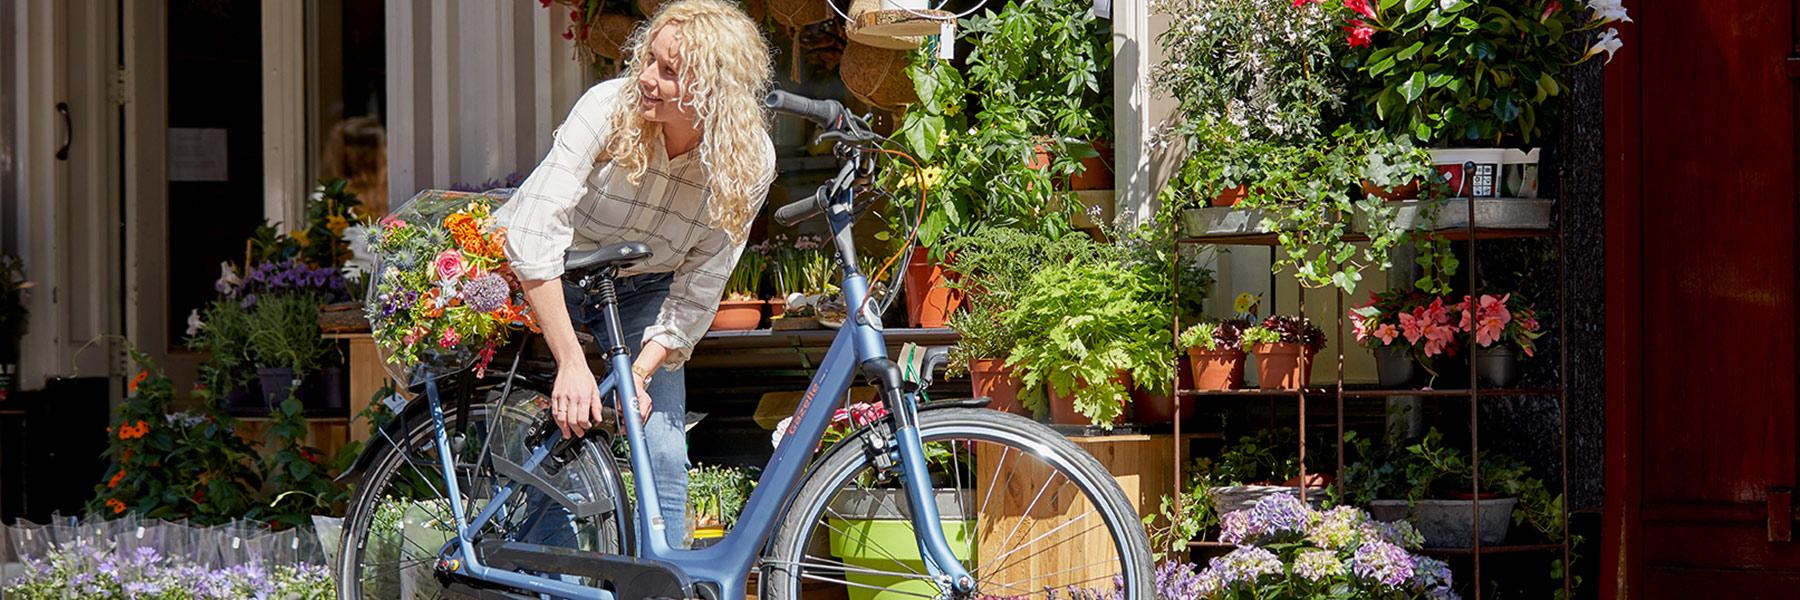 Inspirerende fietsers